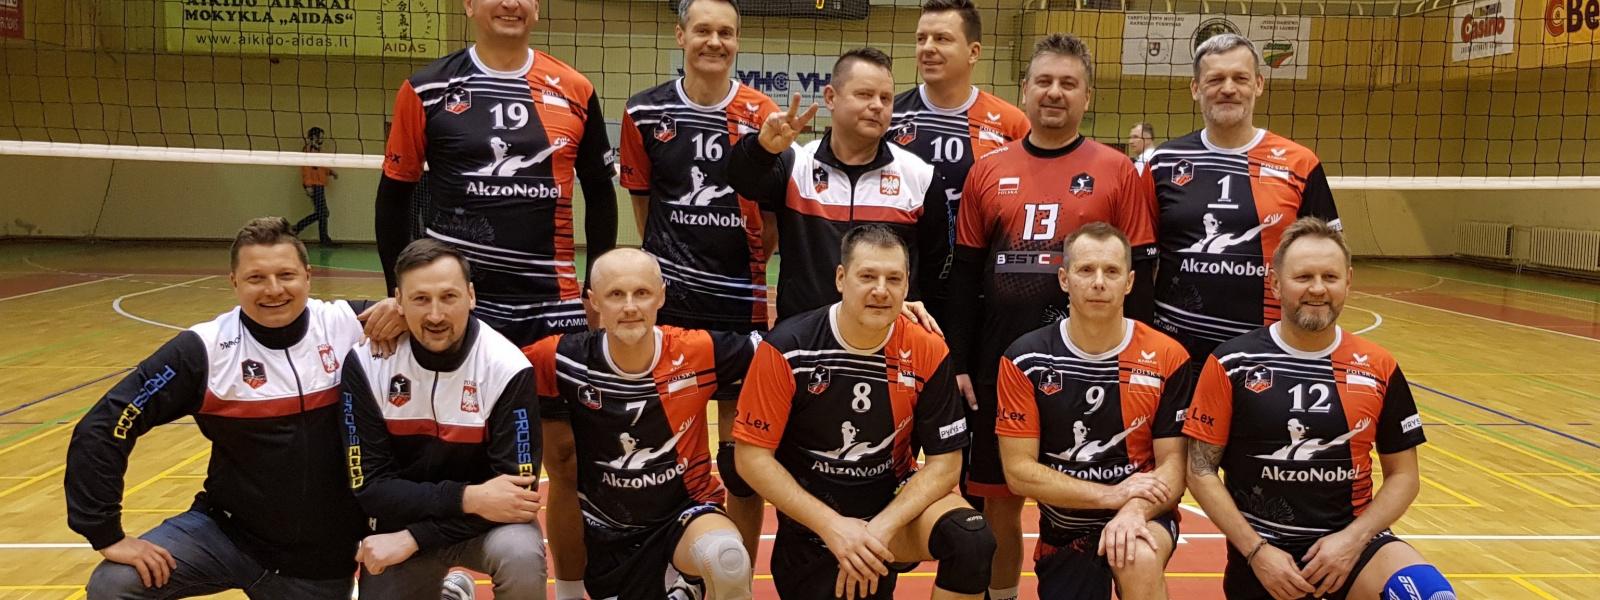 50-ty medal Kaman Volley - z Litwy ze złotem i srebrem EEVZA 2018